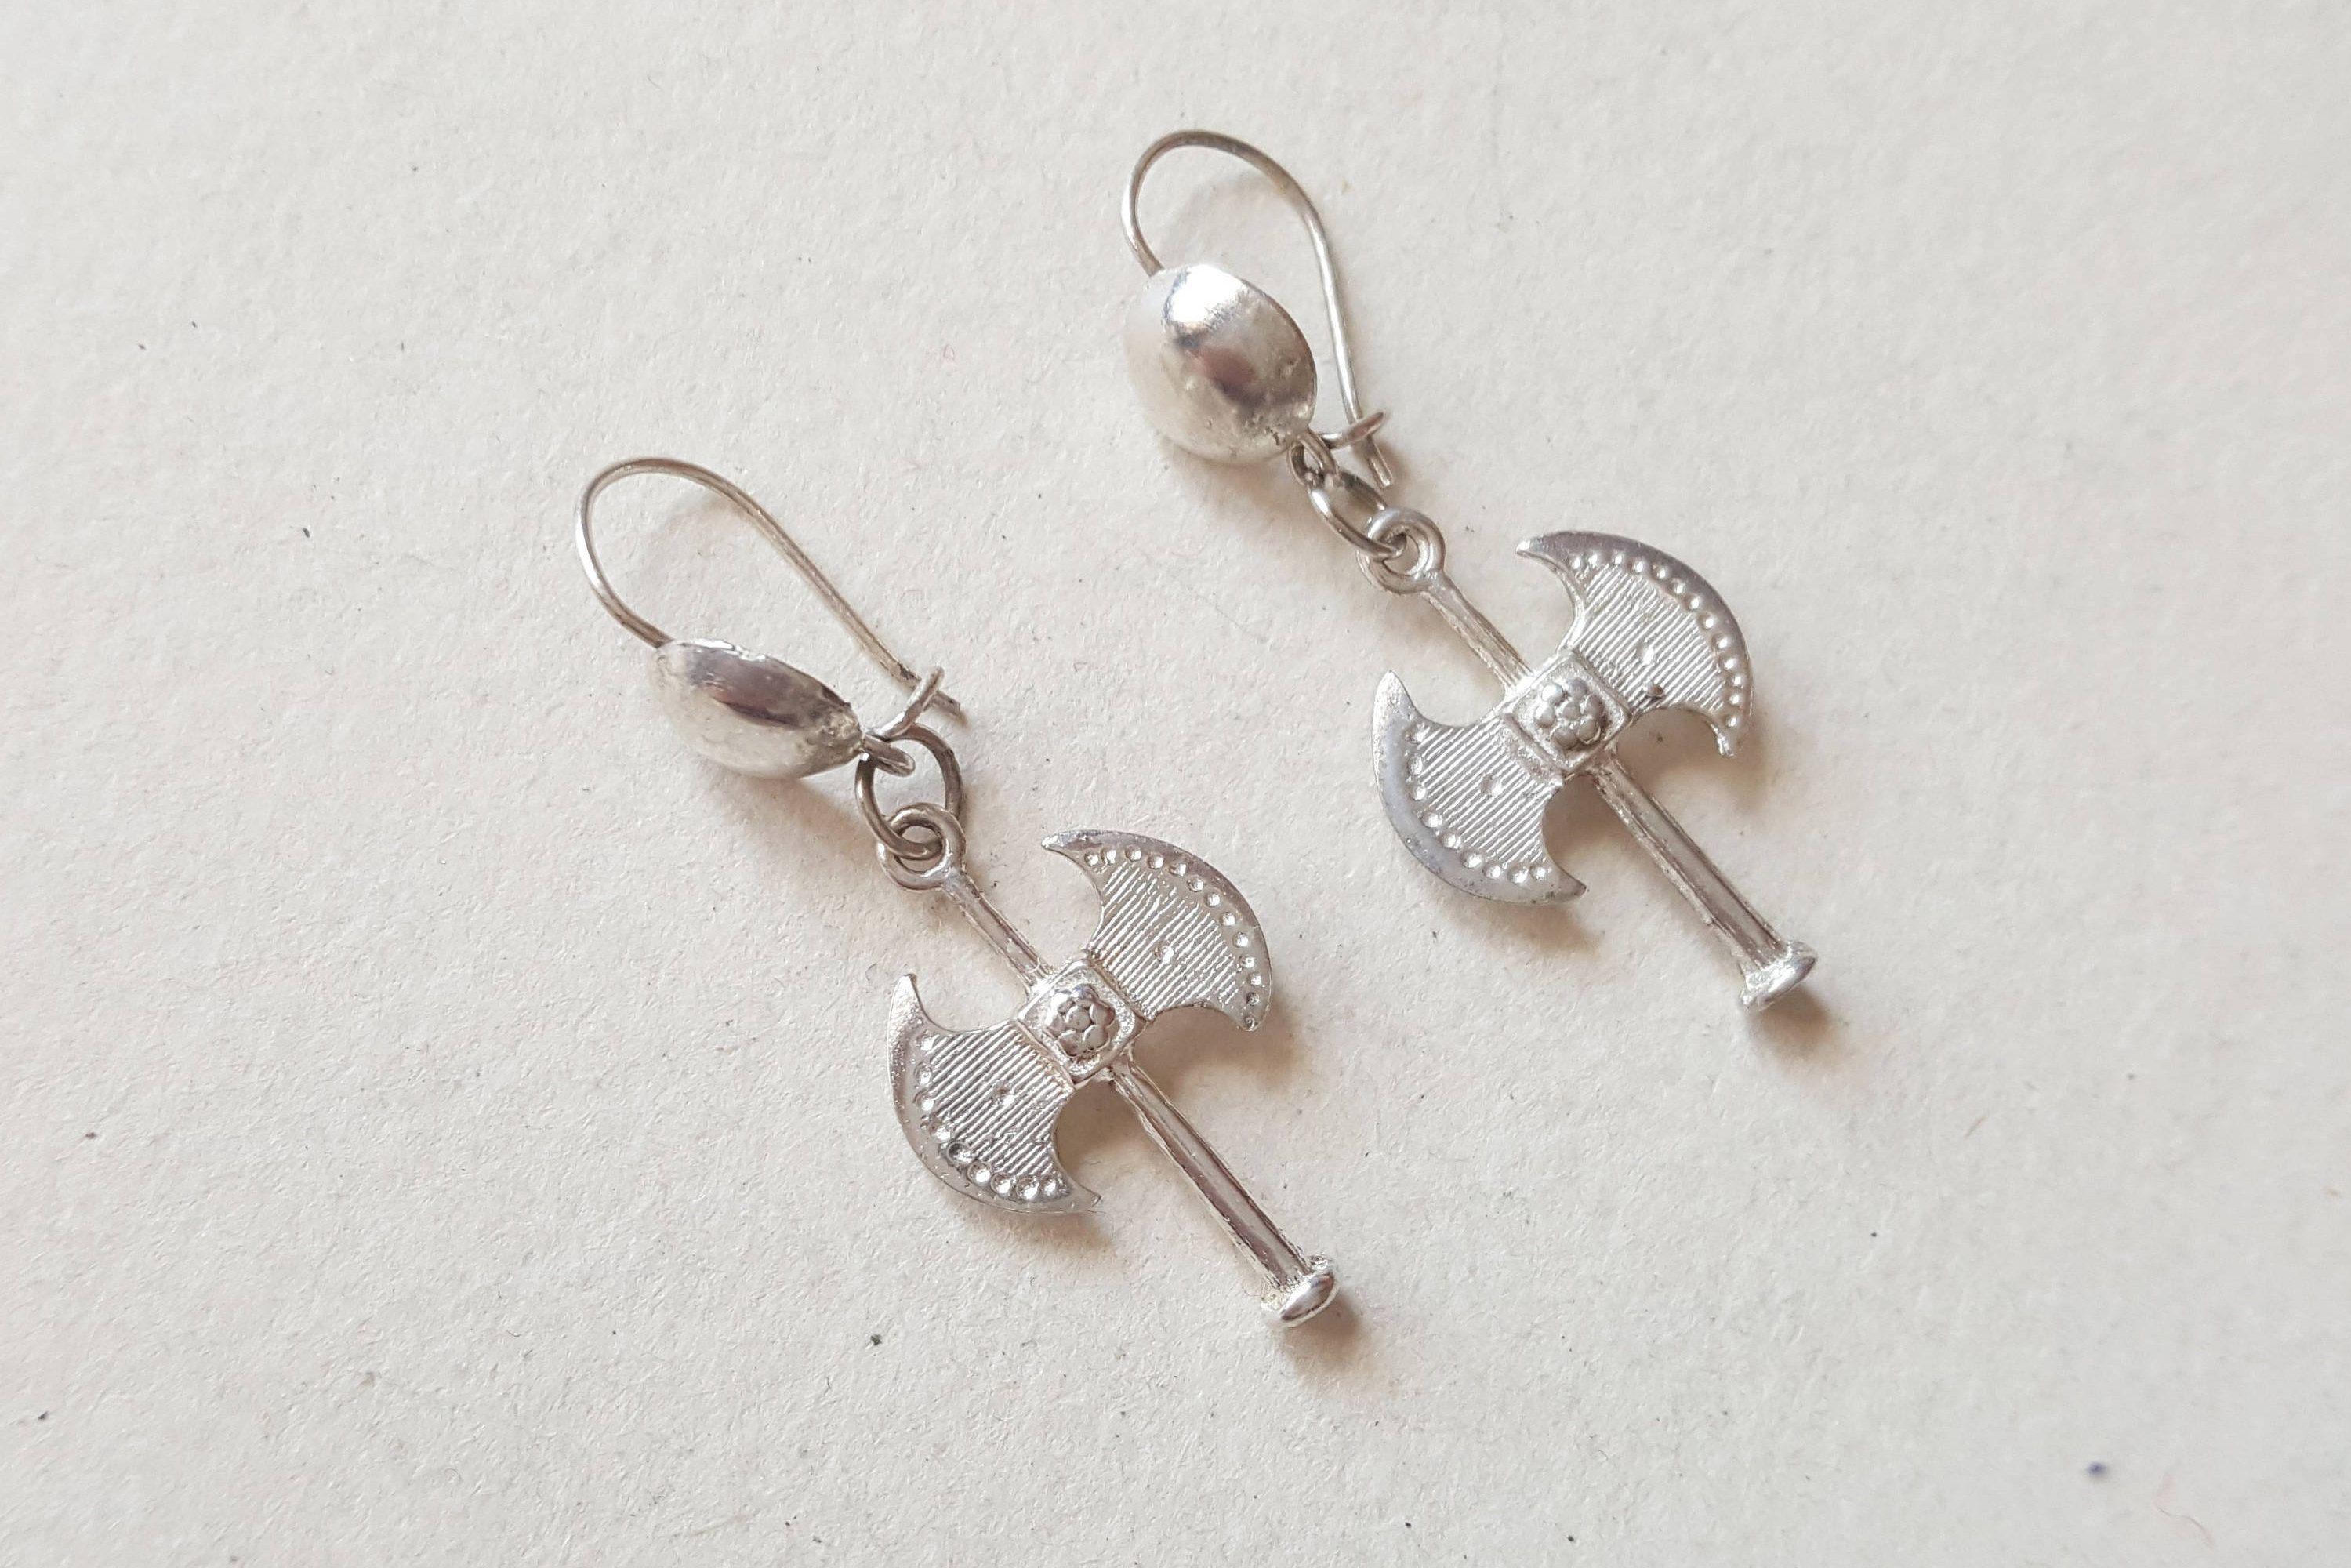 Vintage viking style sterling silver earrings f916